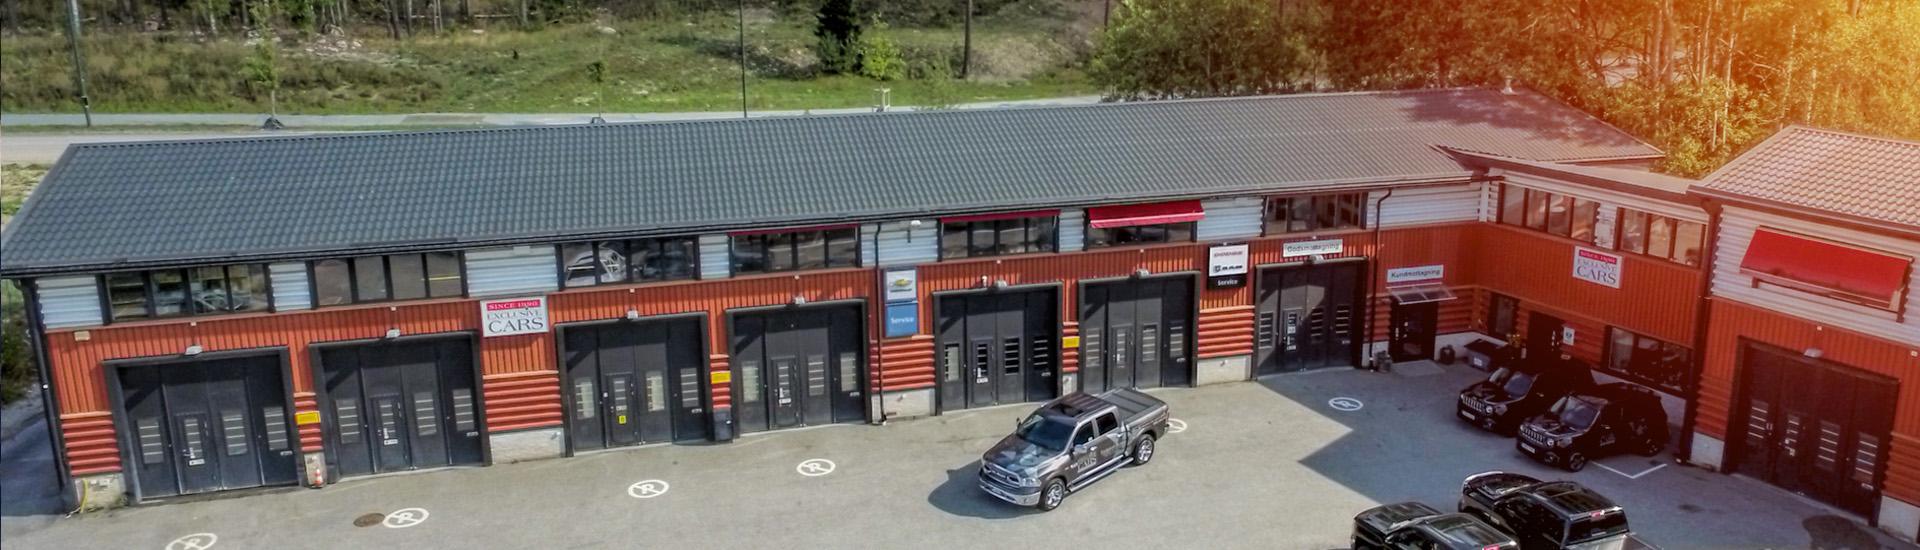 Exclusive Cars Täby